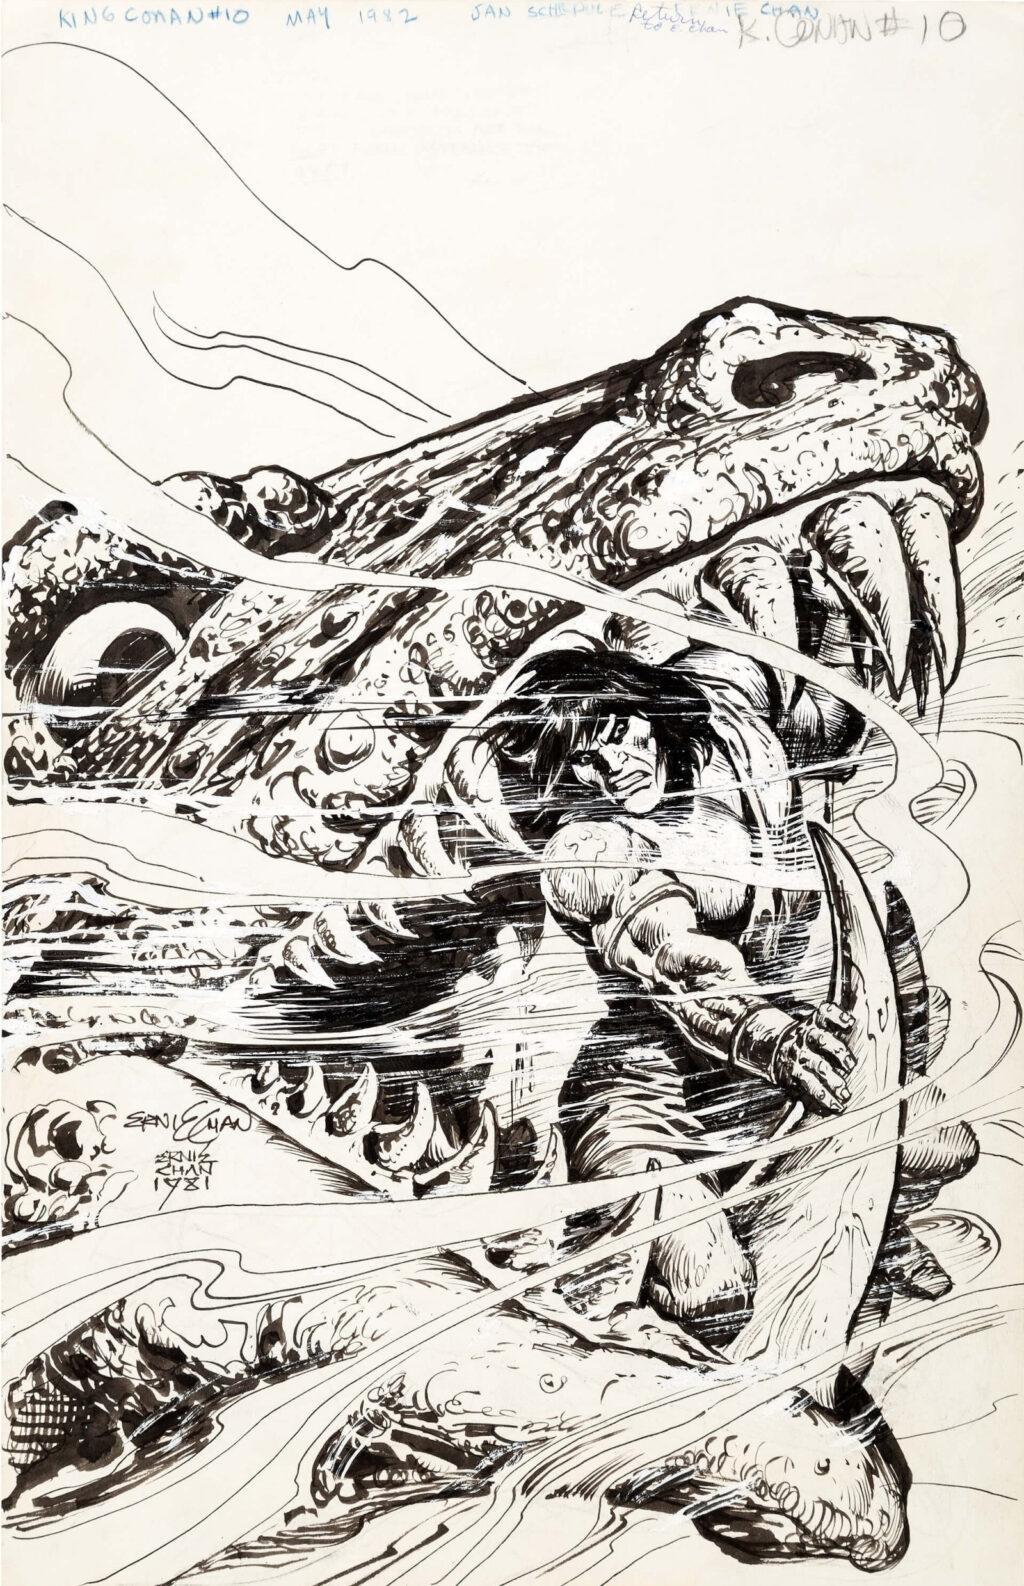 King Conan issue 10 splash by Ernie Chan